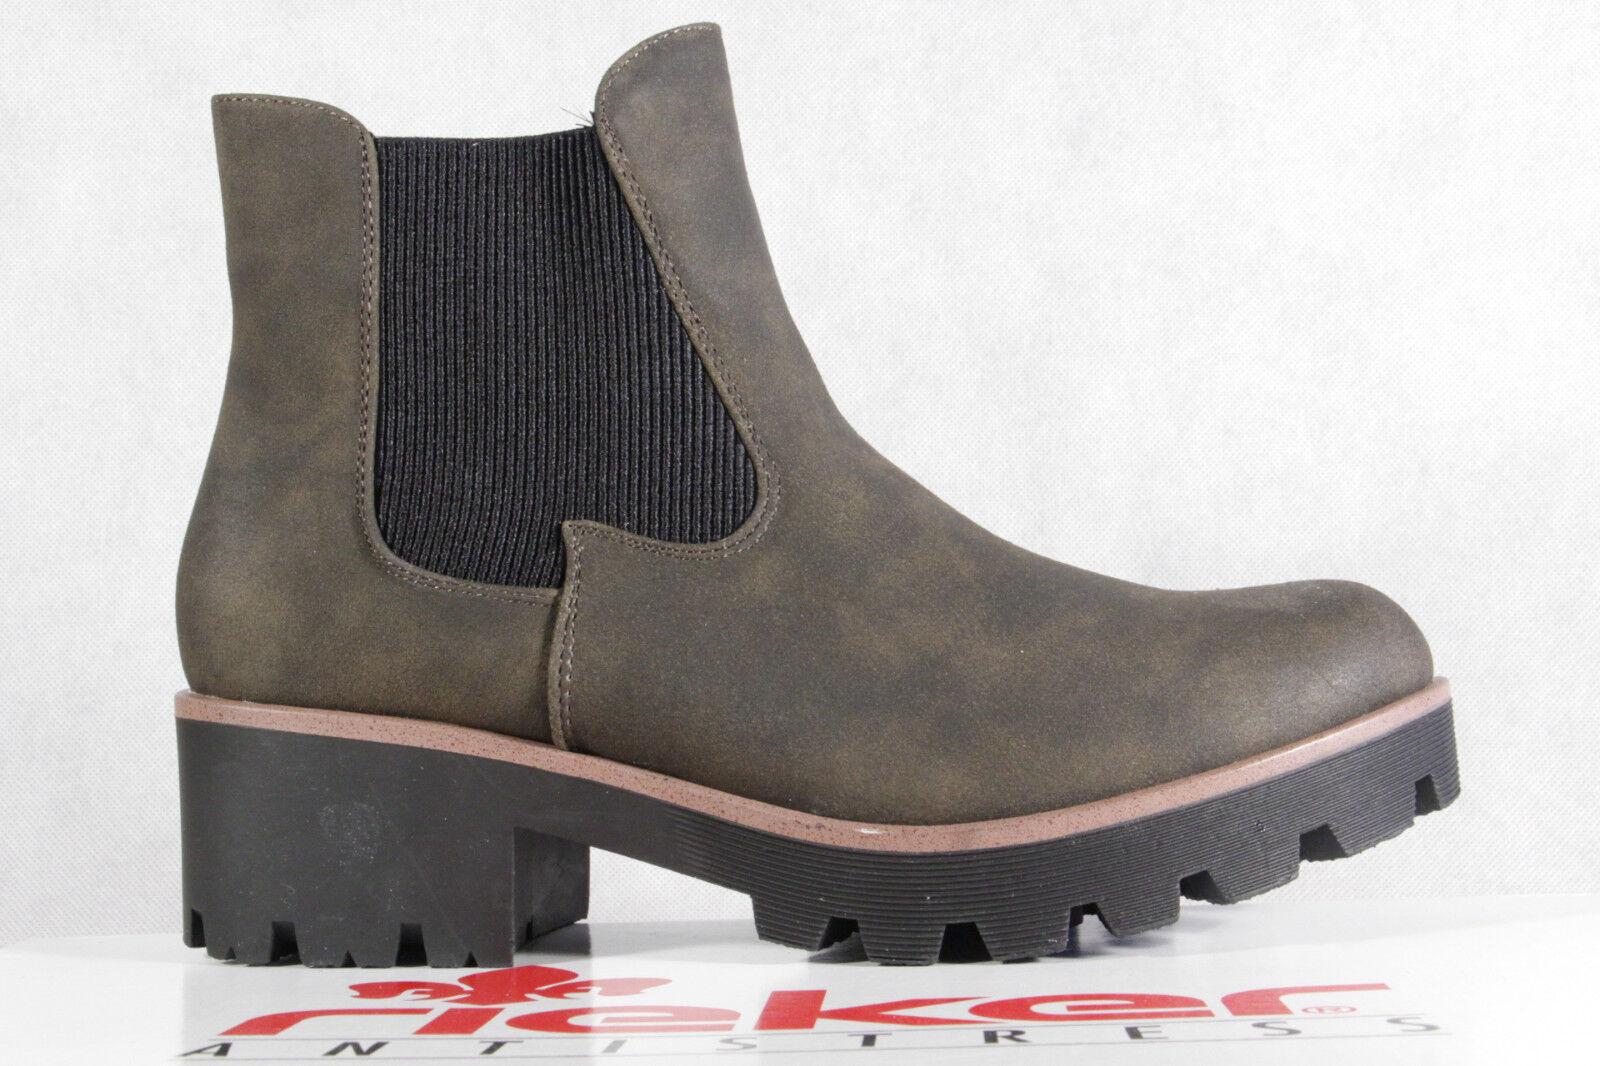 605c423d4a98ea Rieker Damen Stiefel Stiefelette Stiefeletten Boots grün 99254 NEU ...